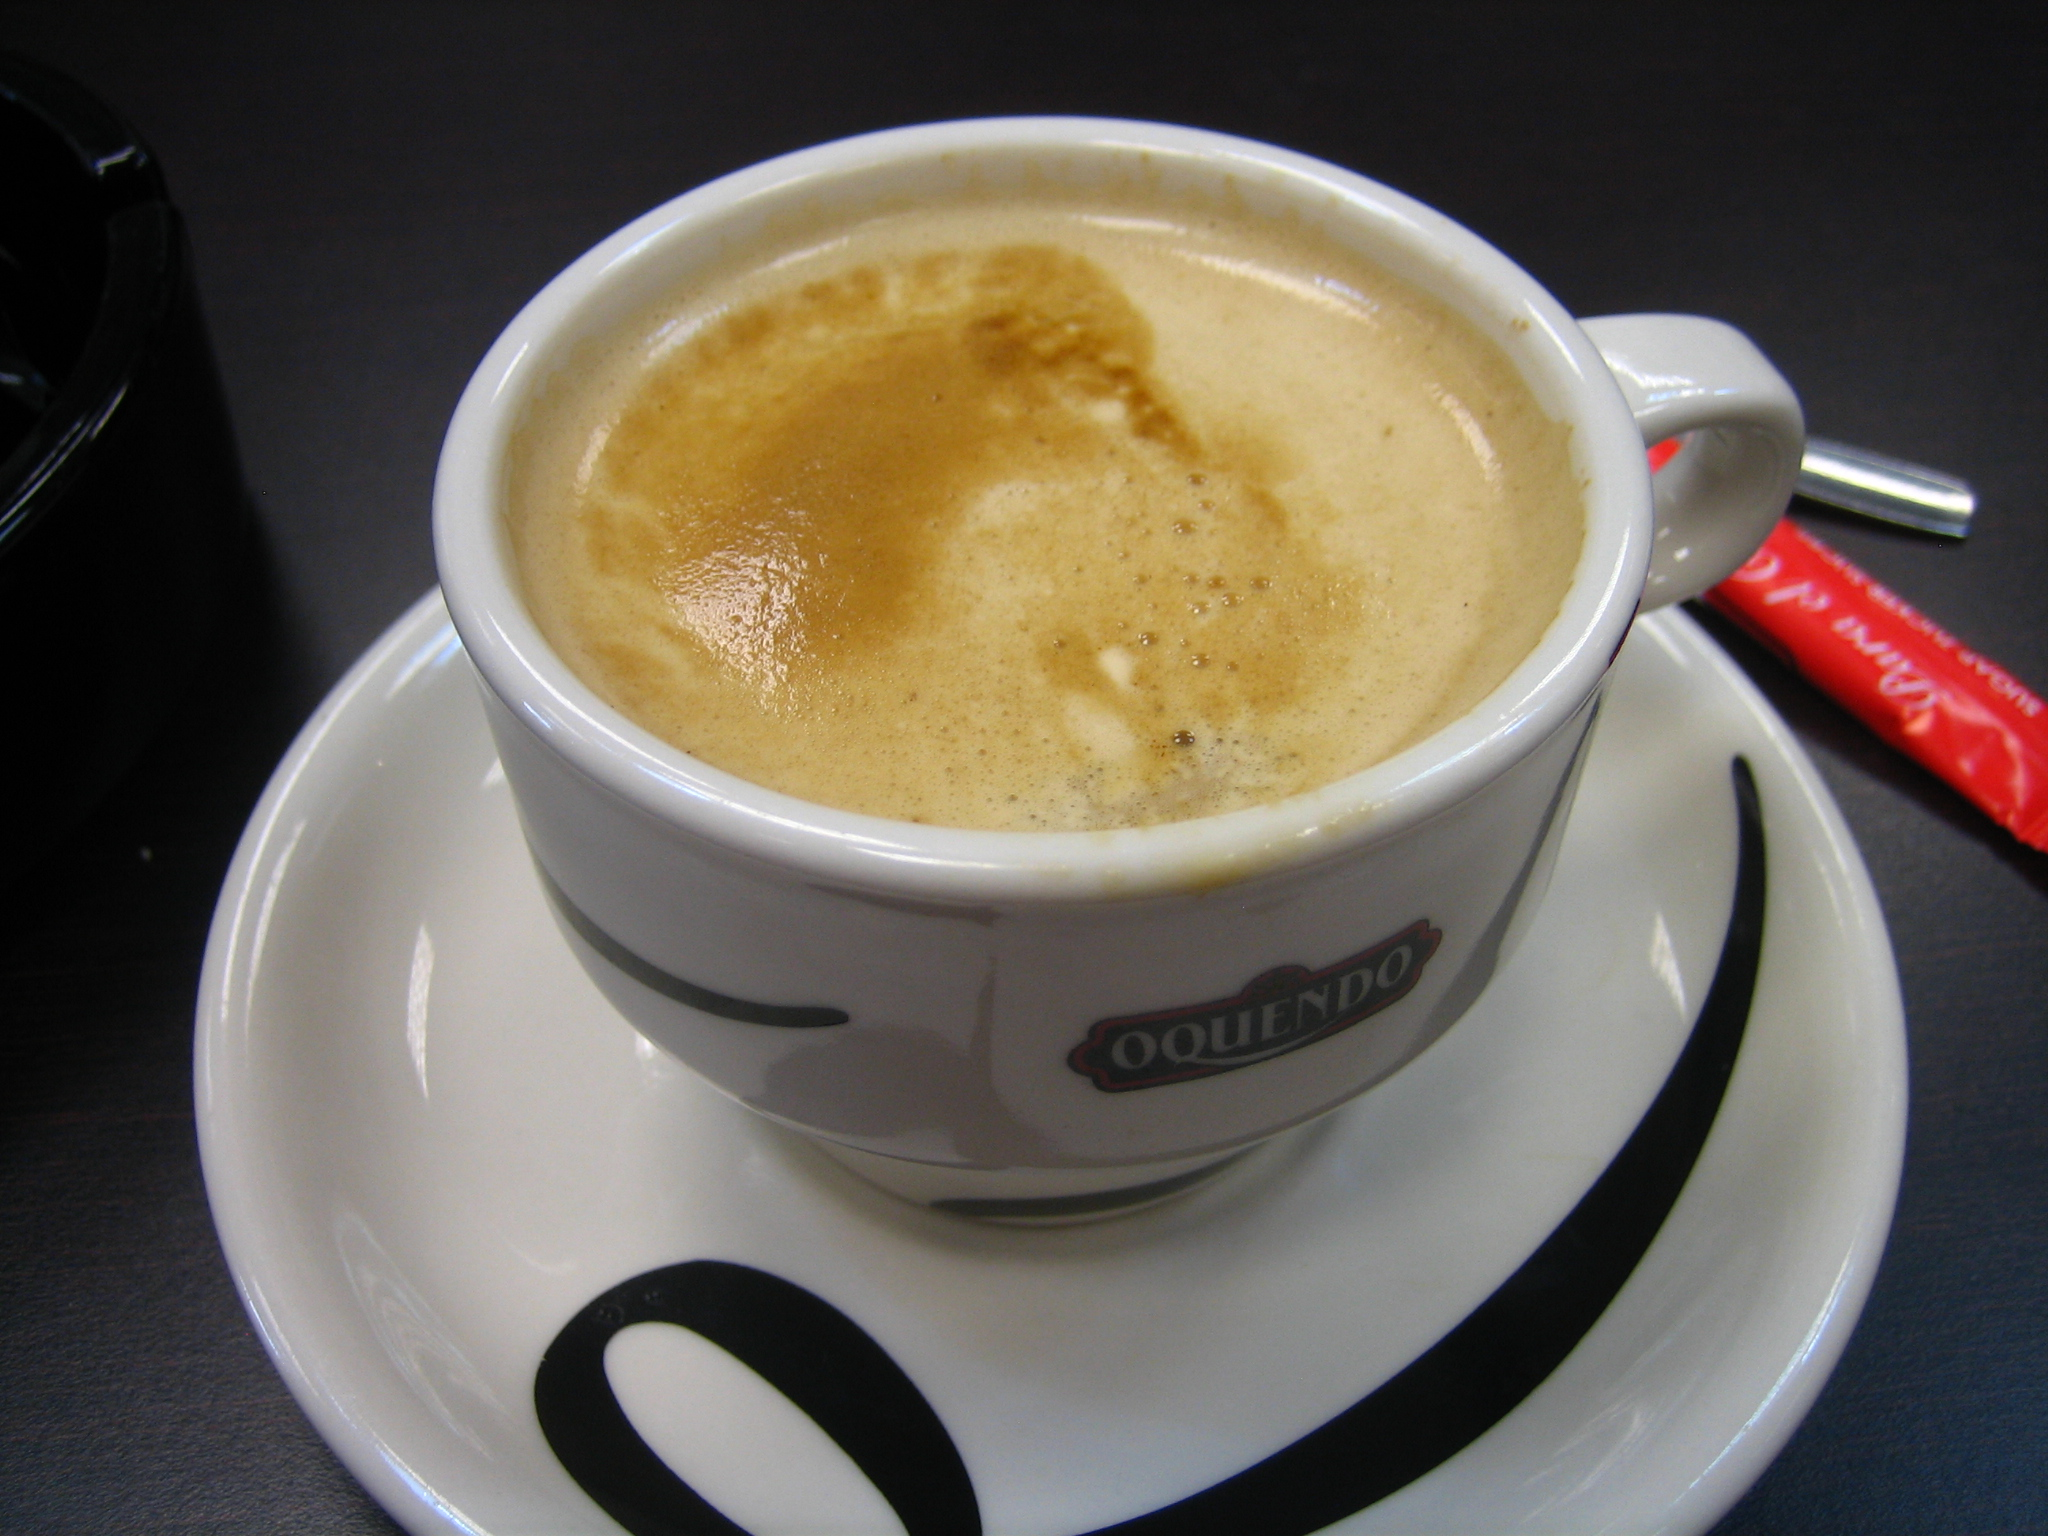 Cafe Noir Coffee Maker